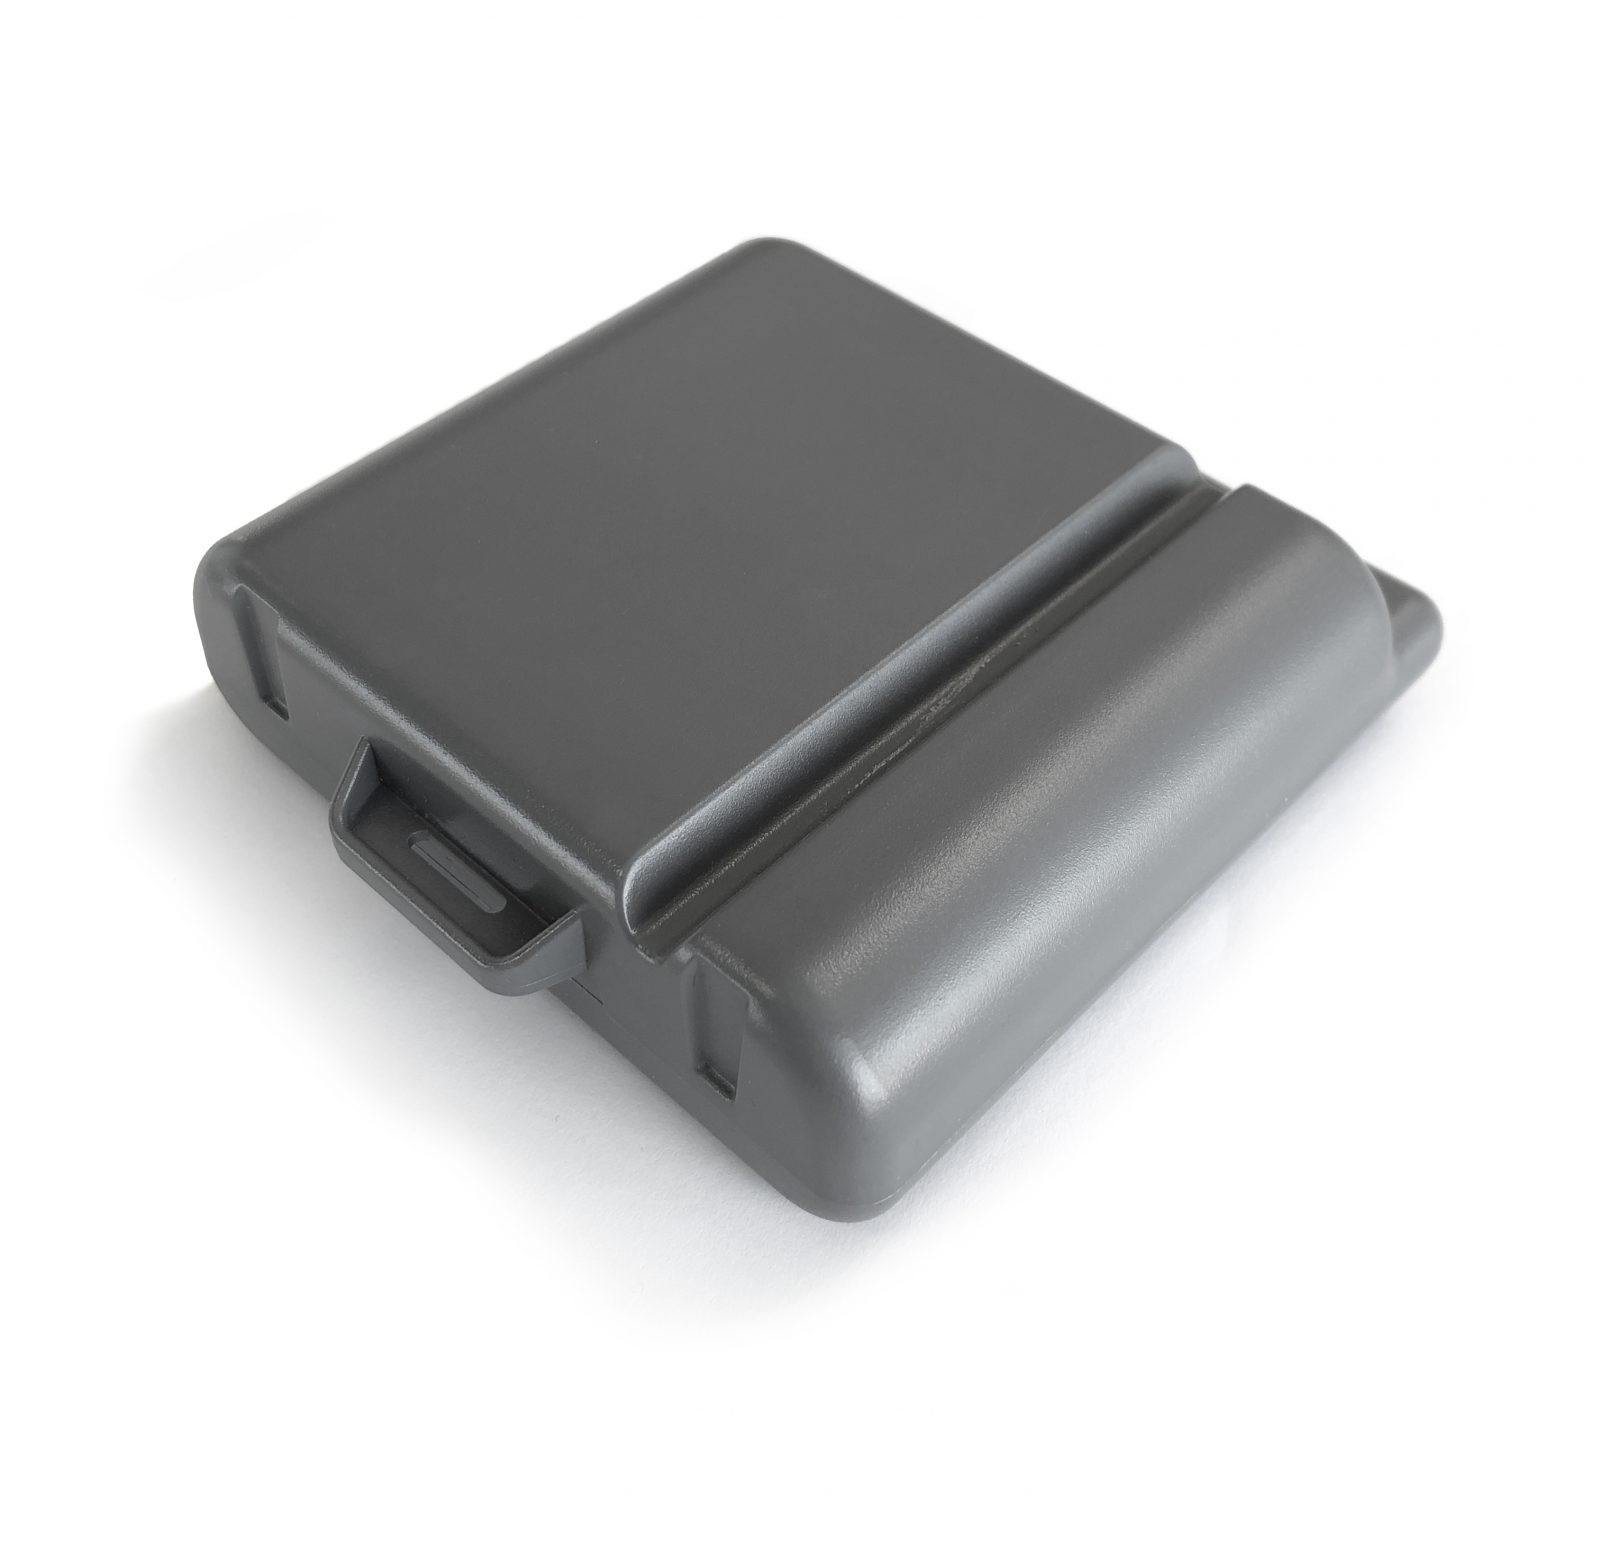 rpb px5 papr battery